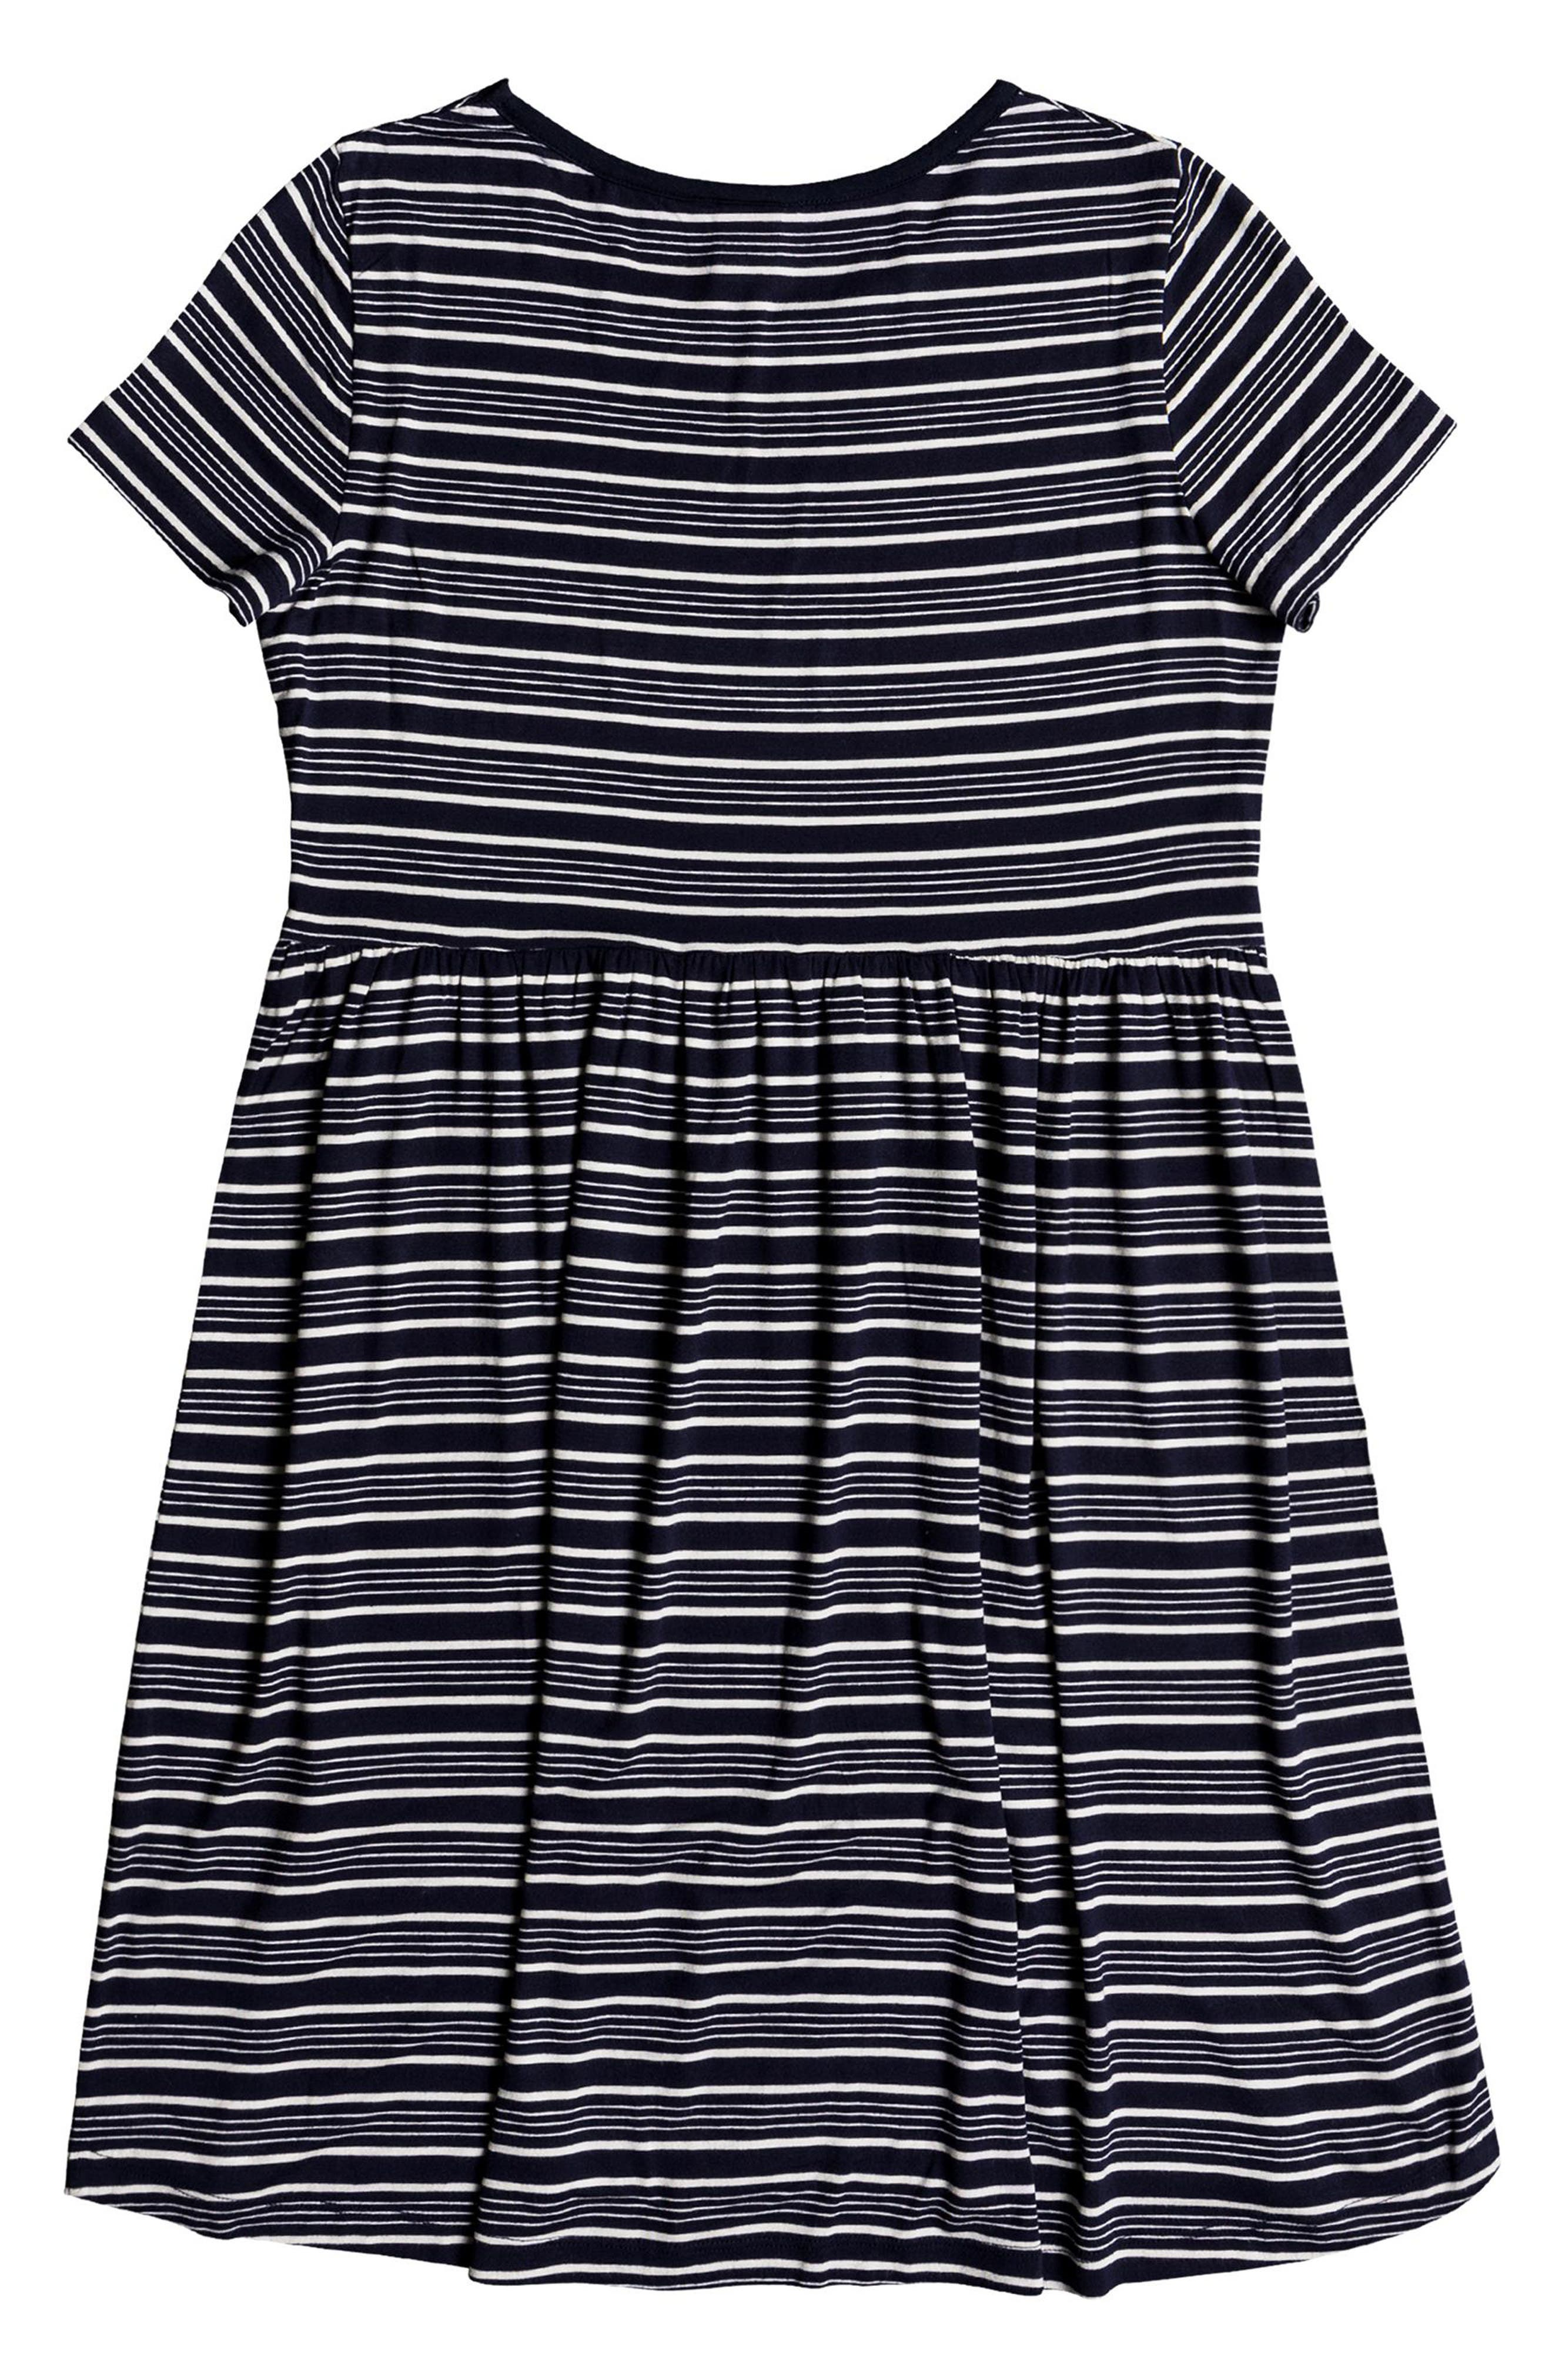 Fame For Glory Stripe T-Shirt Dress,                             Alternate thumbnail 4, color,                             400